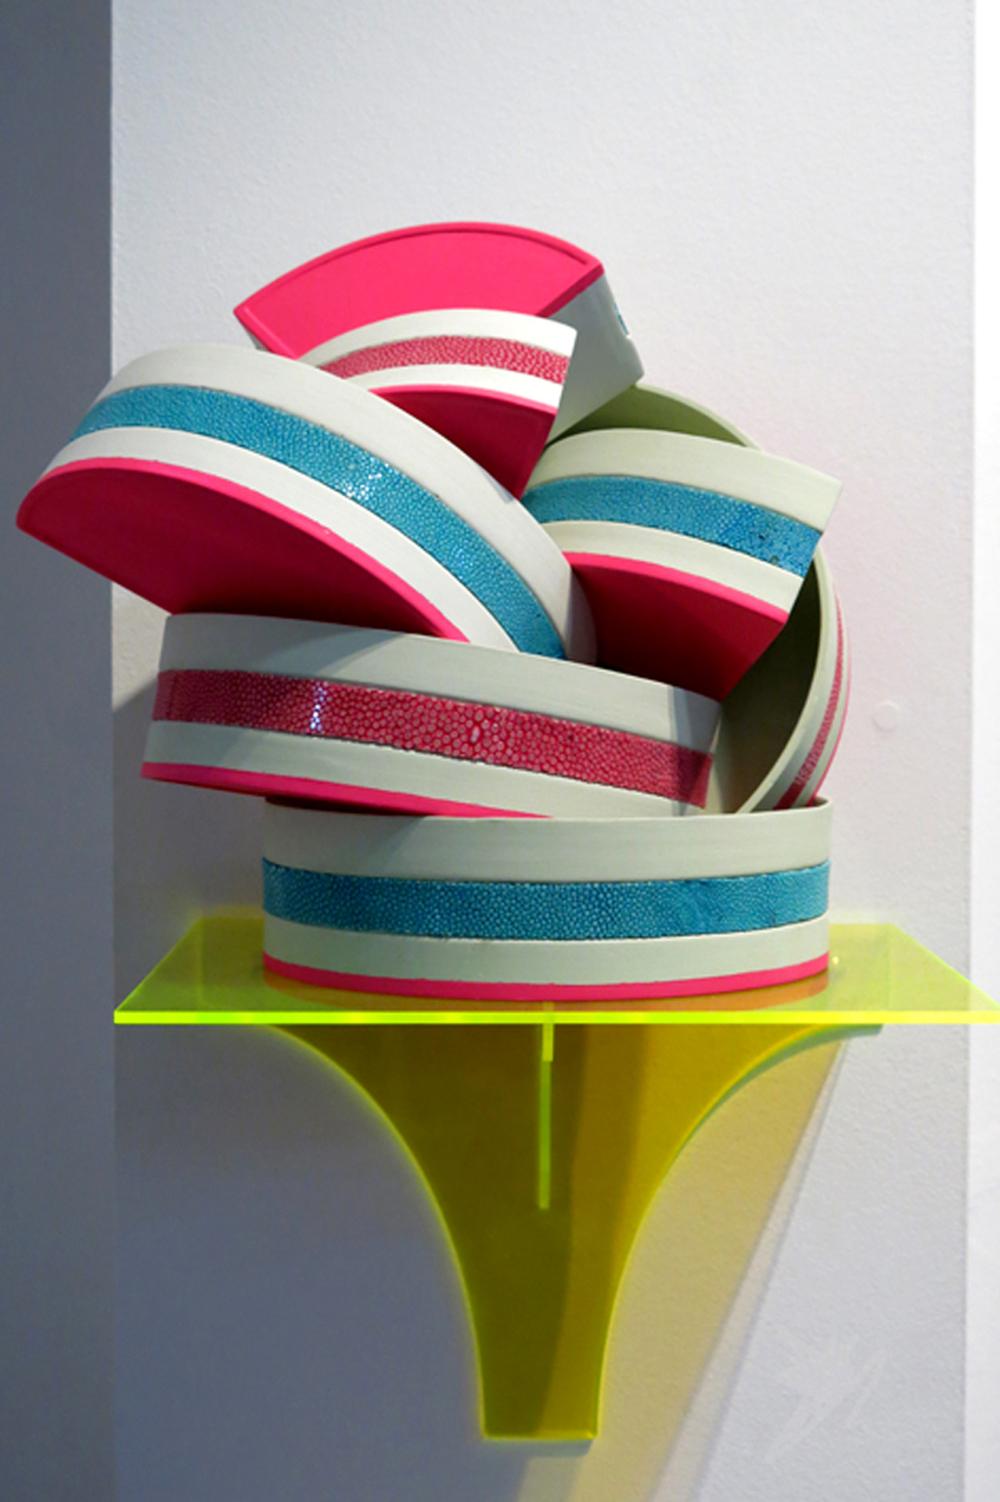 Elise Menghini, Ceramic and Shagreen bowls.jpg